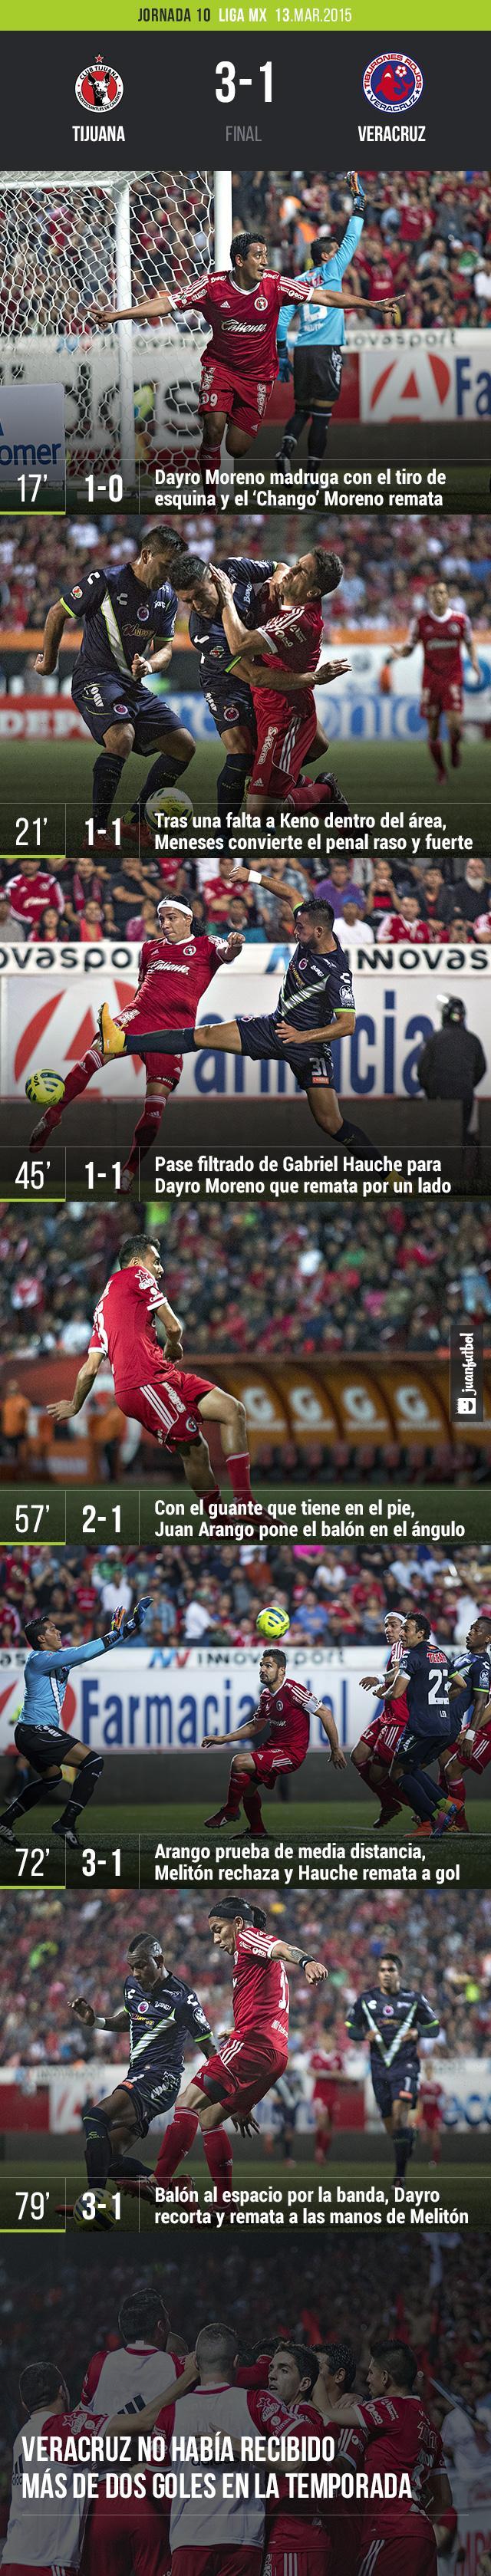 Xolos 3-1 Veracruz